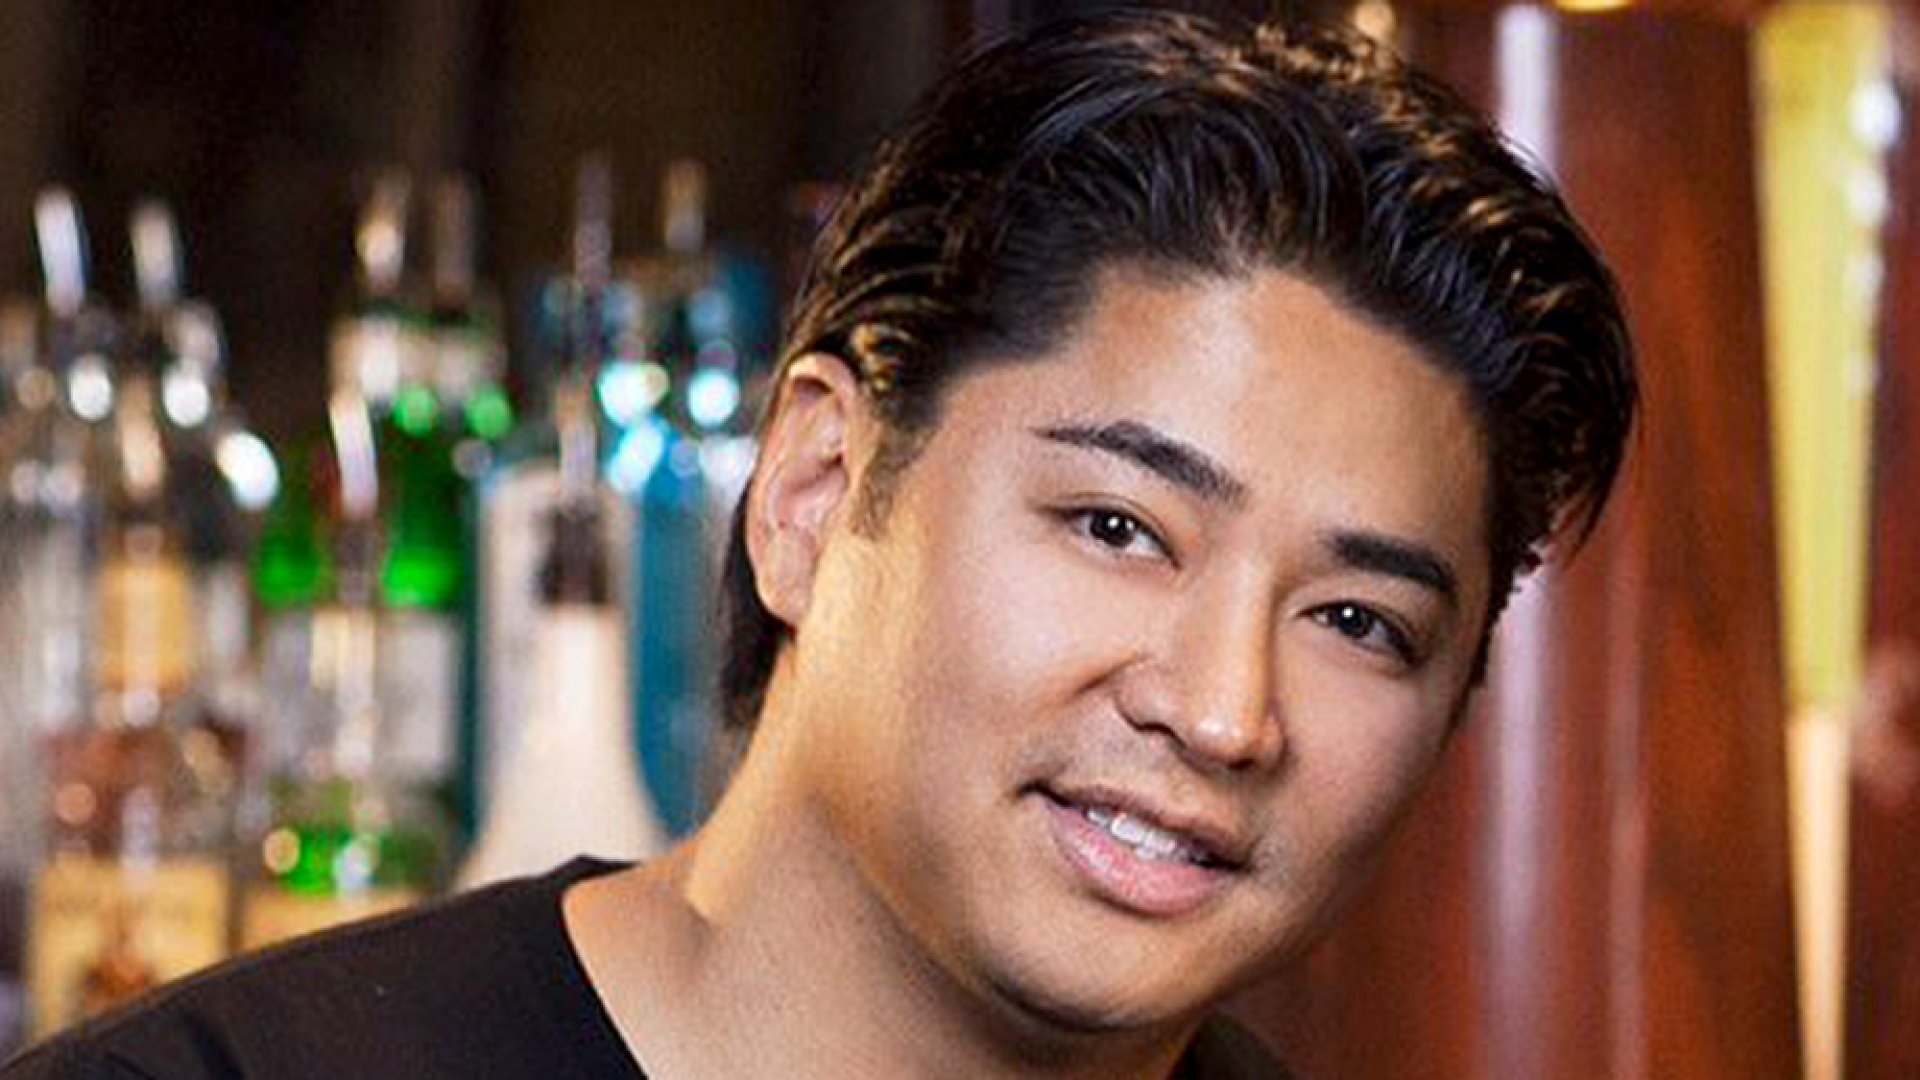 Breathometer founder Charles Michael Yim